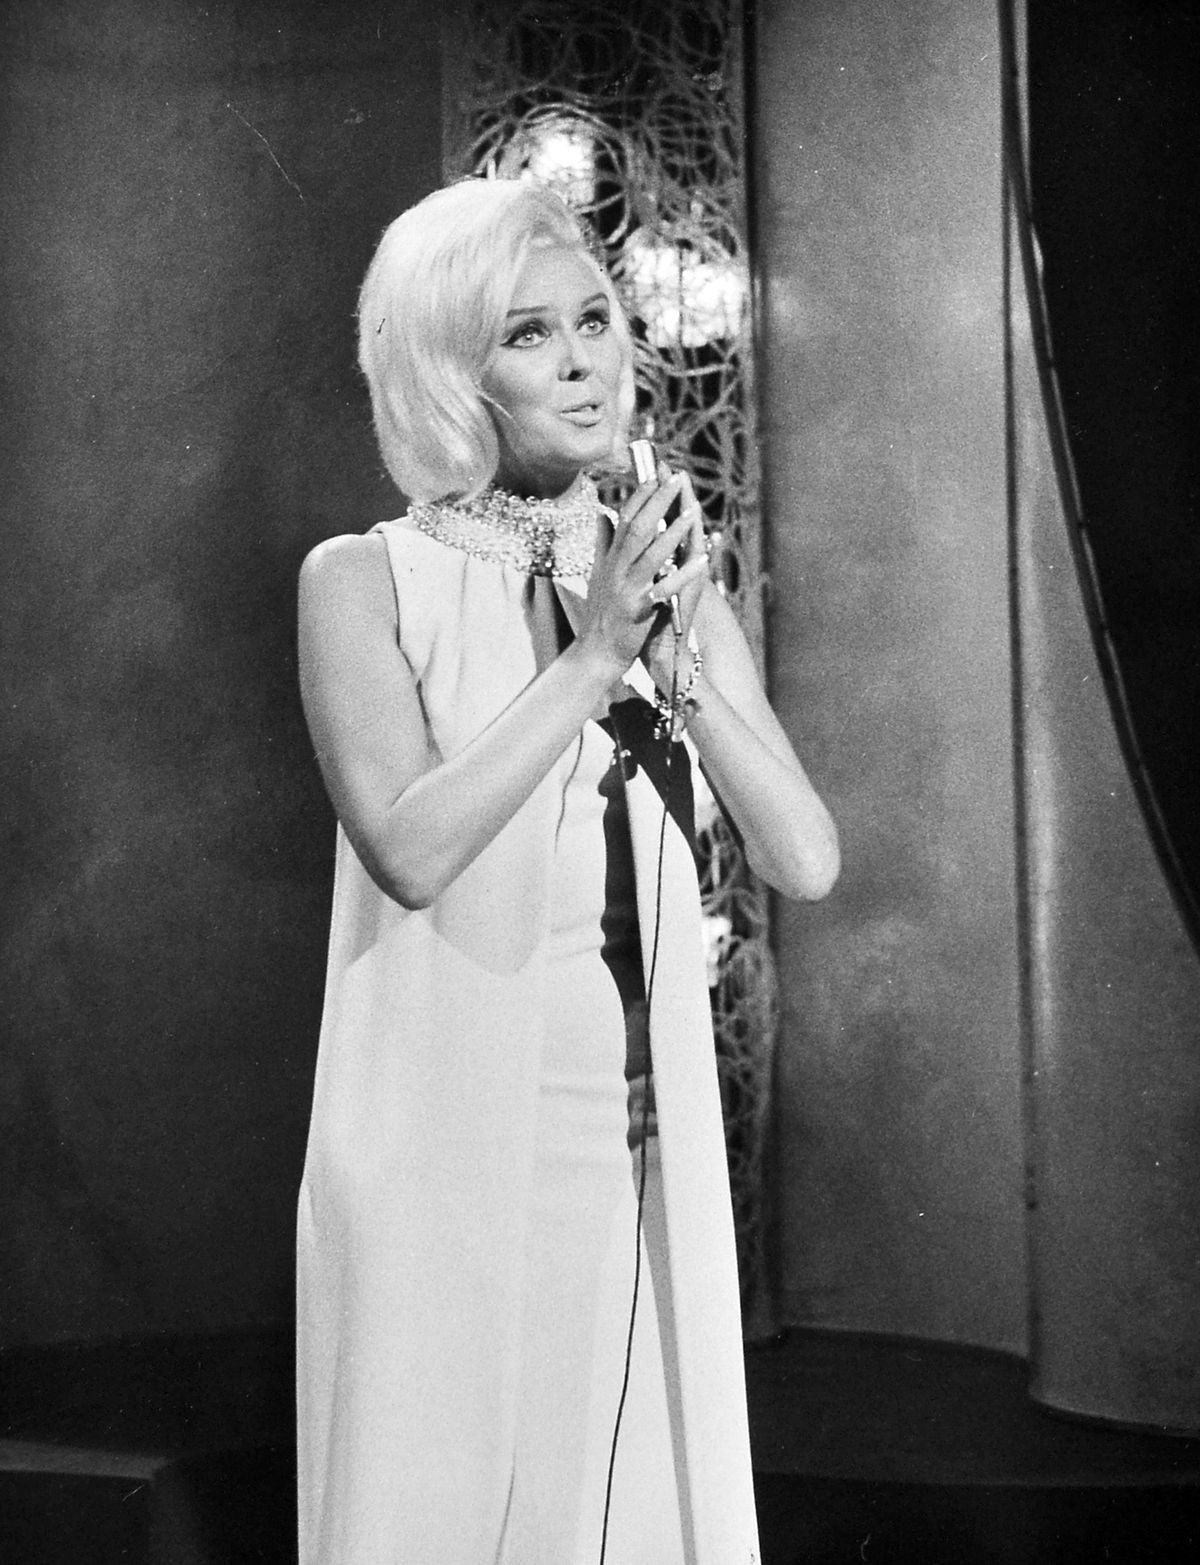 Janie Marden, a 1960s singing star born Janet Instone in Broseley.